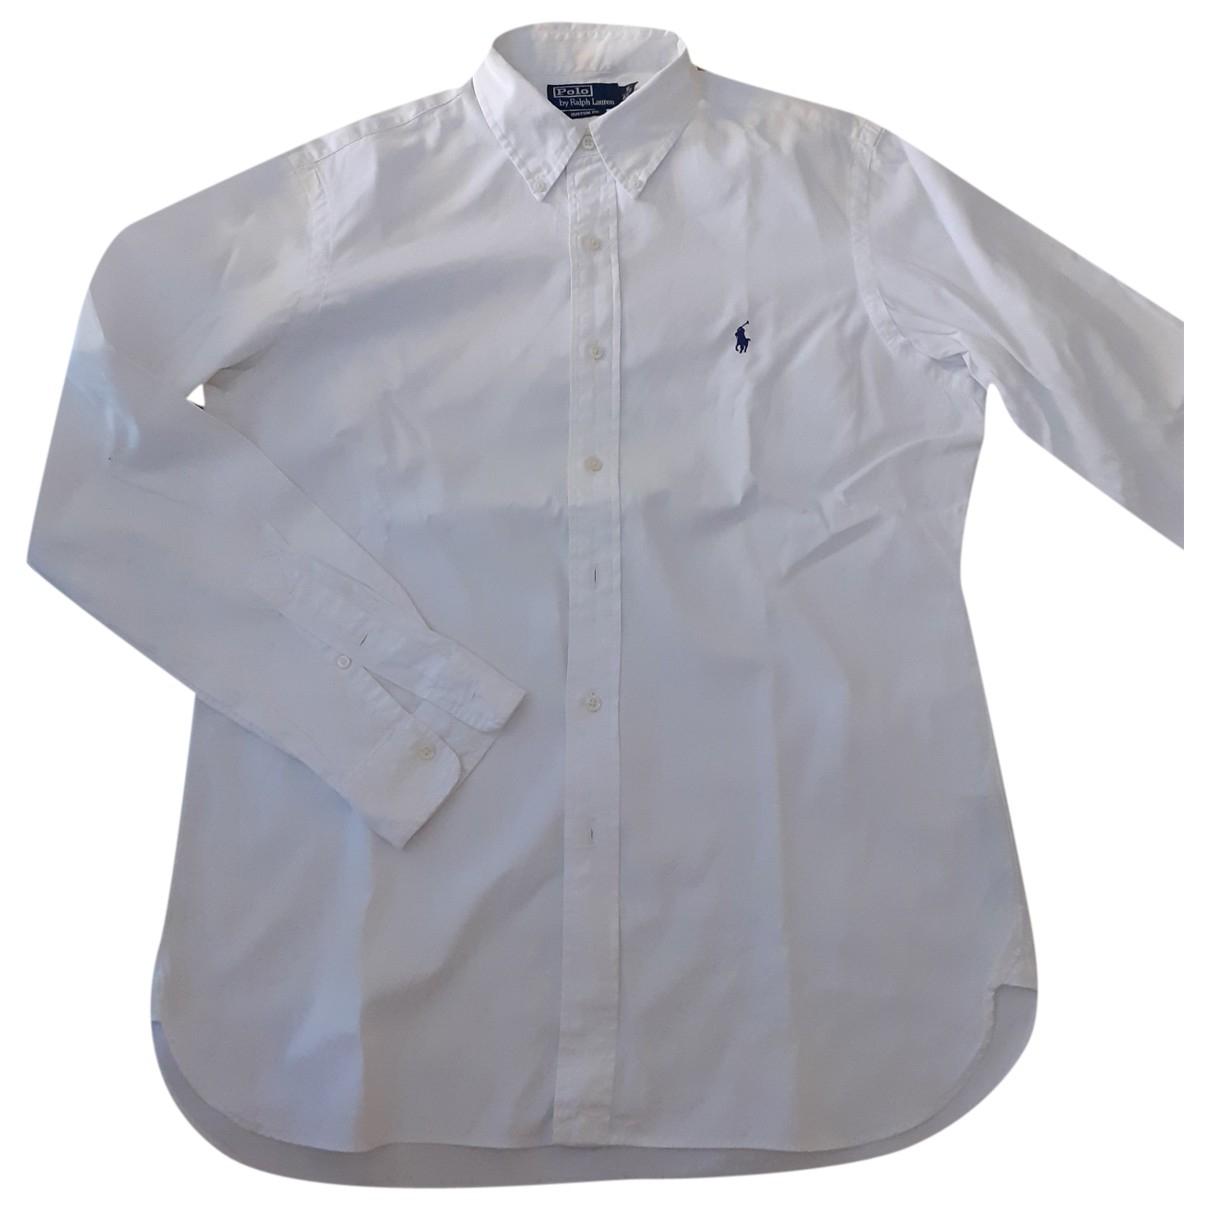 Polo Ralph Lauren \N White Cotton Shirts for Men 16 UK - US (tour de cou / collar)